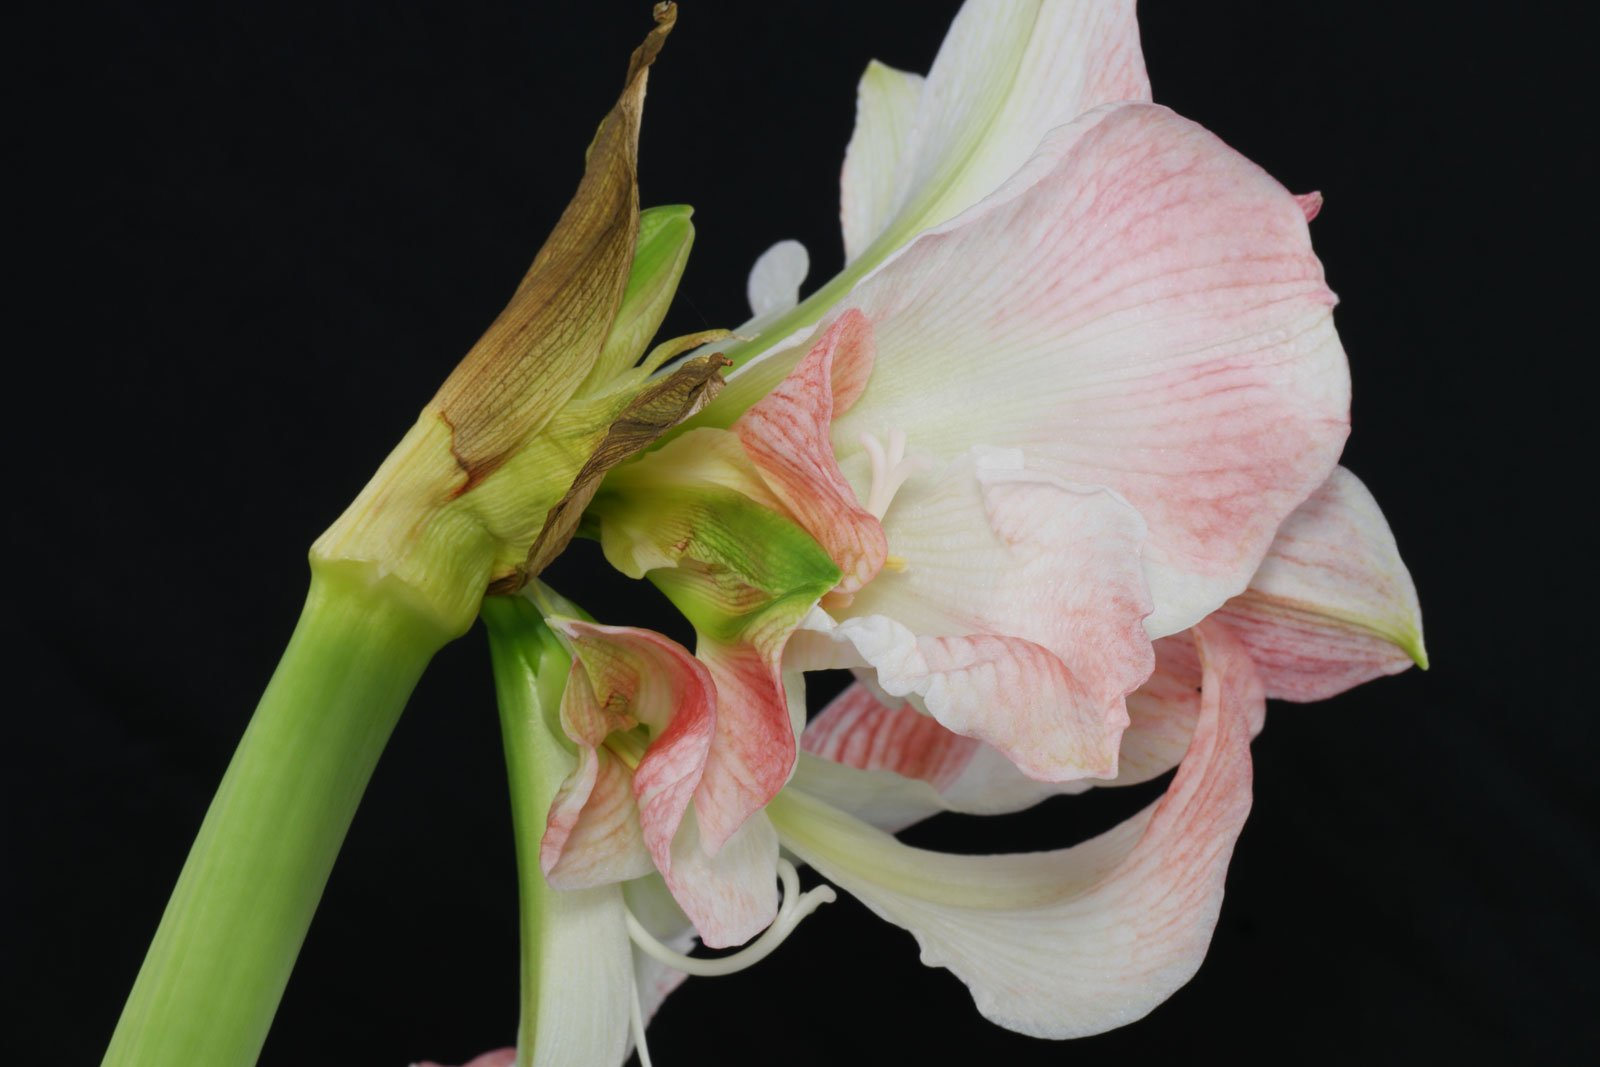 deformierte Amaryllis-Blüte